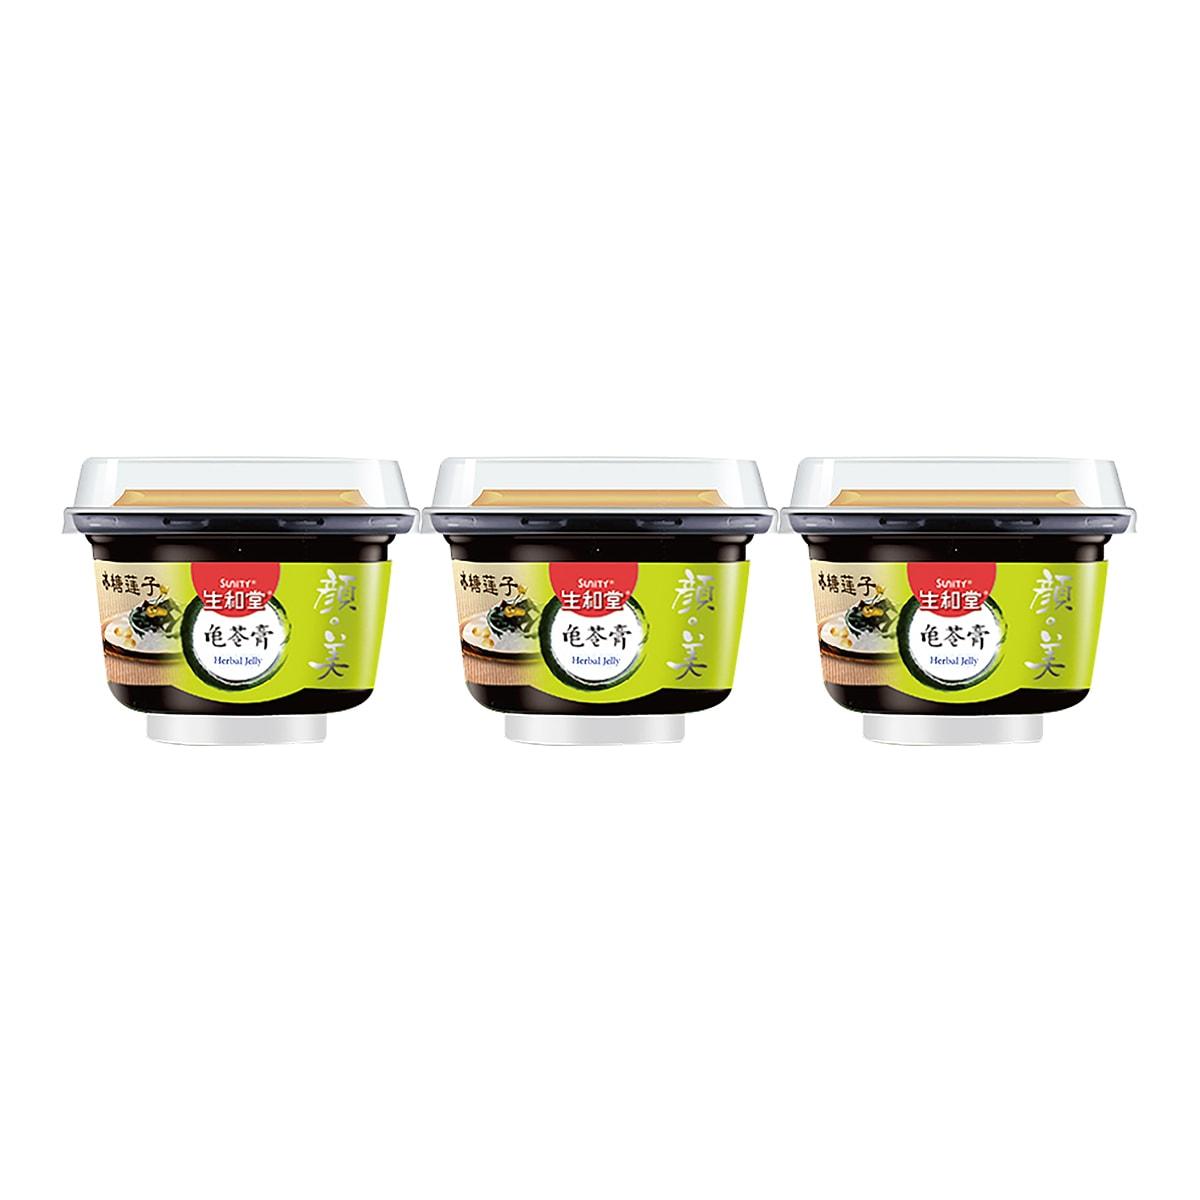 SUNITY Herbal Jelly Rock Sugar & Lotus Seed 3cups 215g*3